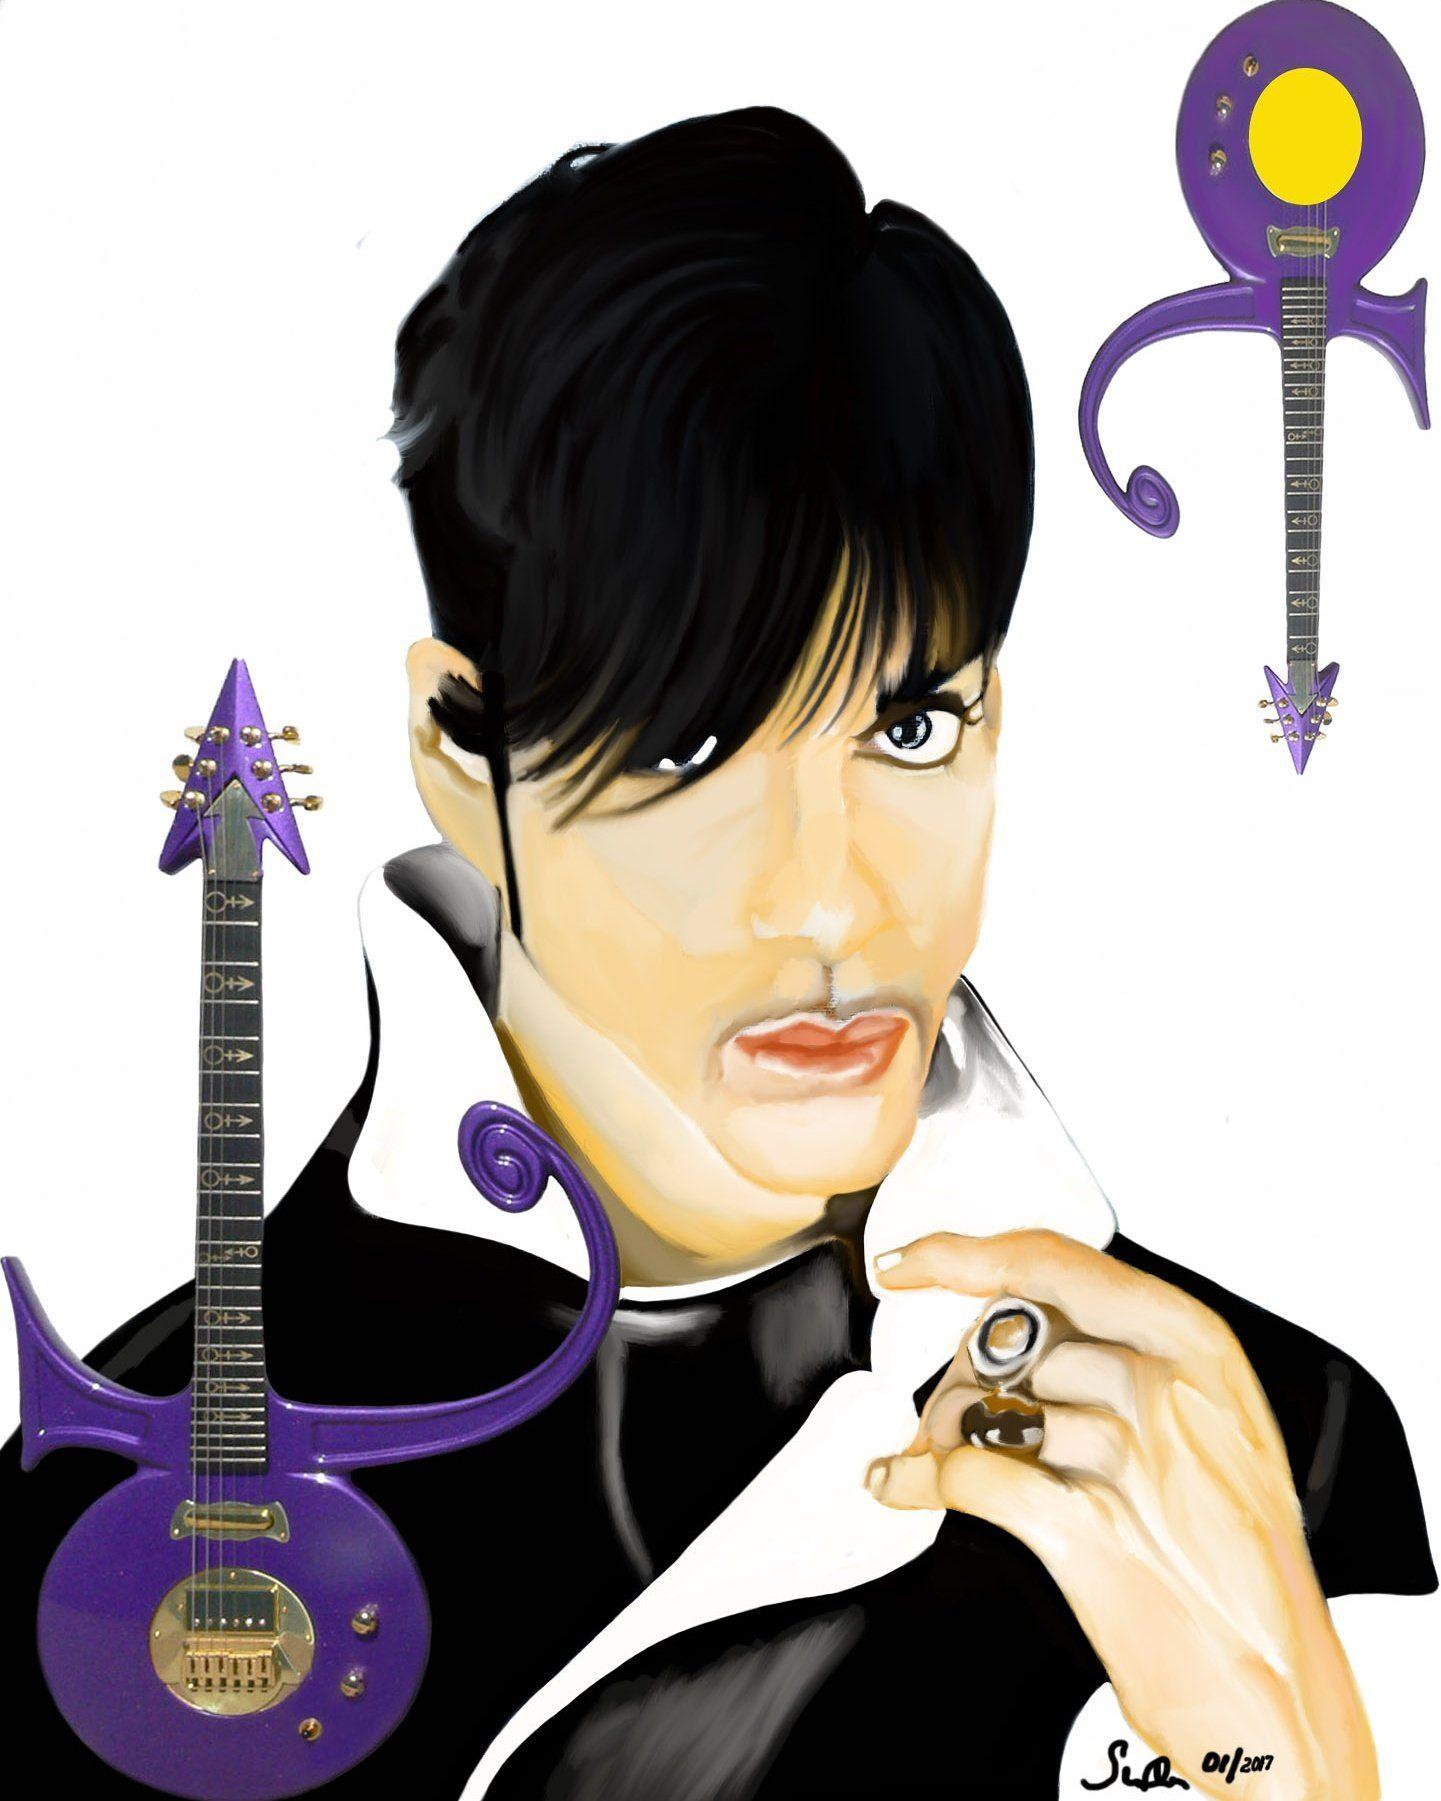 "@SPrestonOrigina : ""Legend"" #digitalart #prince https://t.co/Goz0NU7yyp"